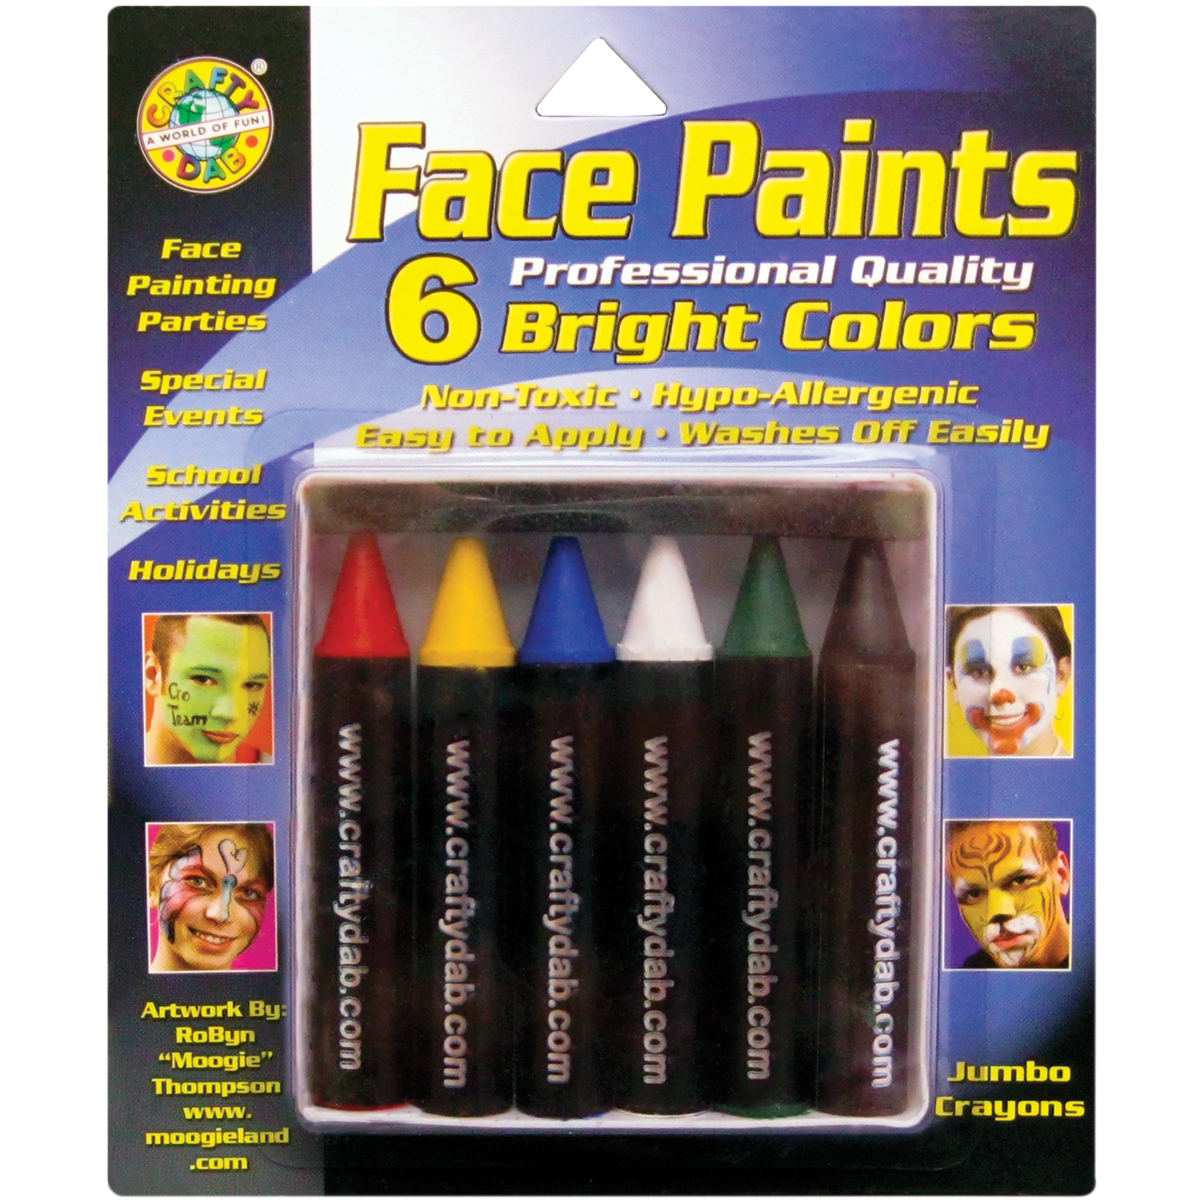 Bright - Jumbo Face Paints